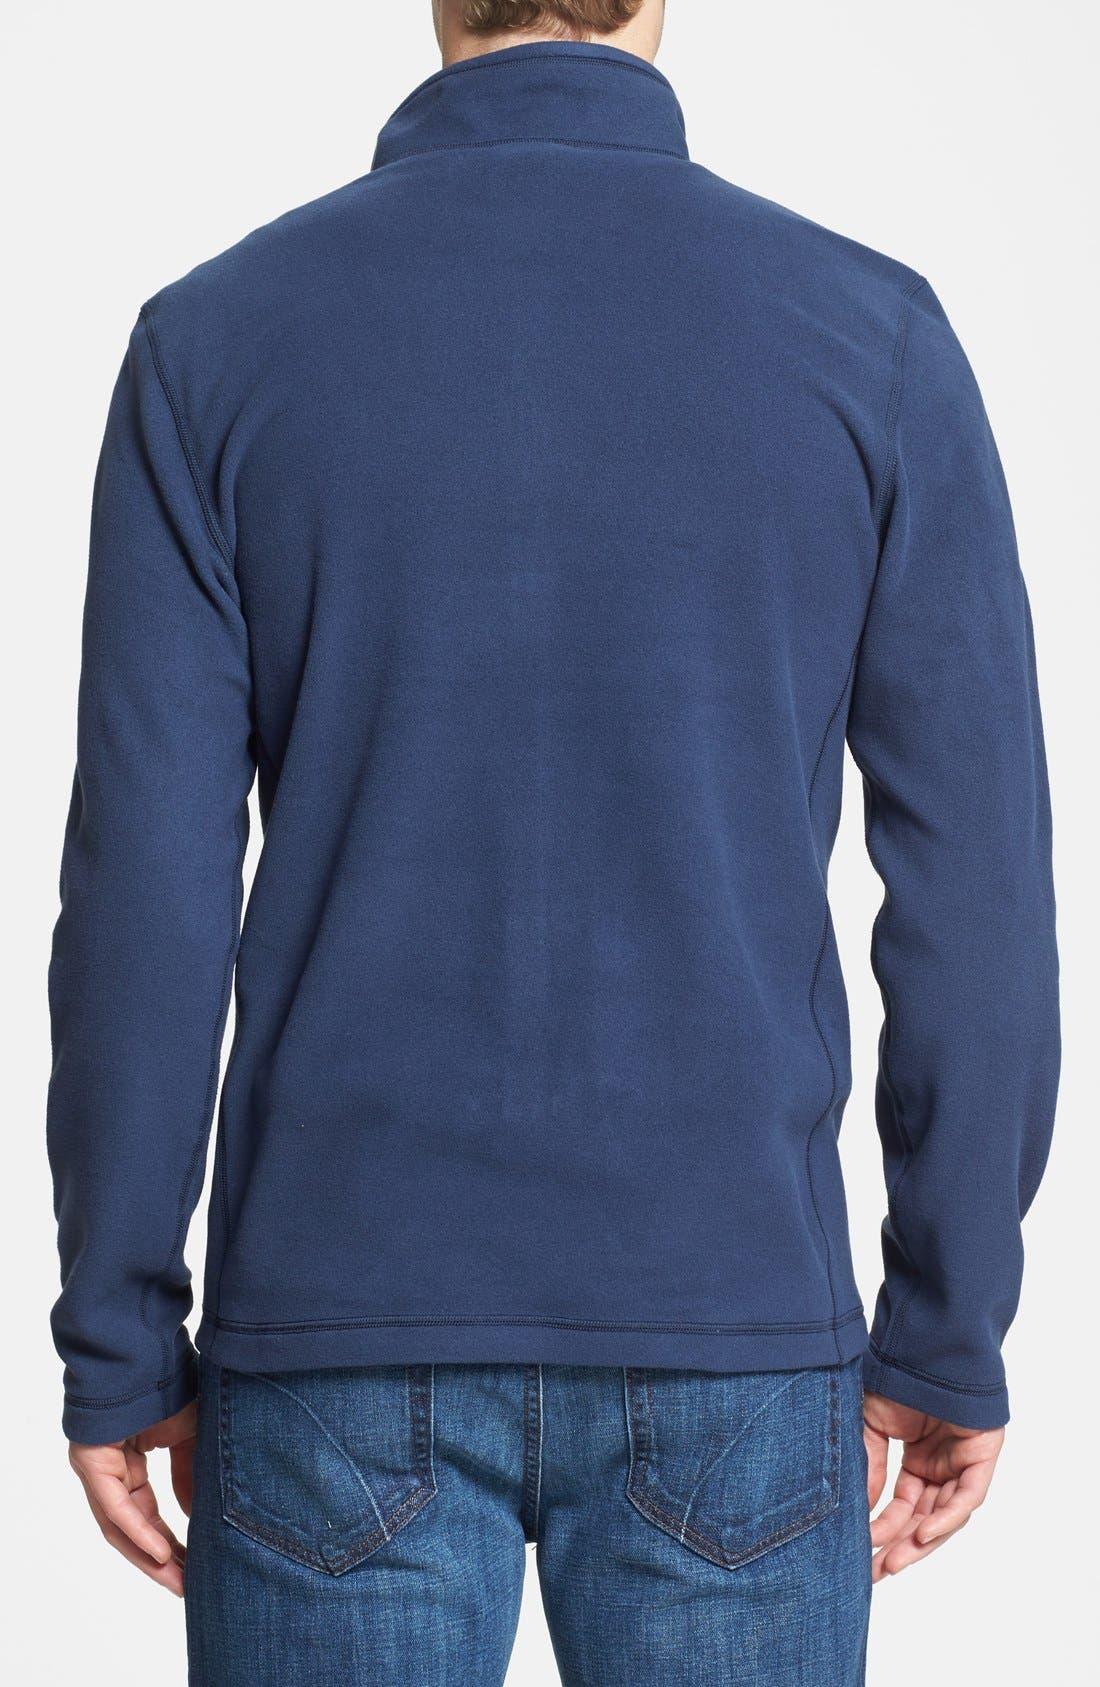 'TKA 100 Glacier' Quarter Zip Fleece Pullover,                             Alternate thumbnail 122, color,